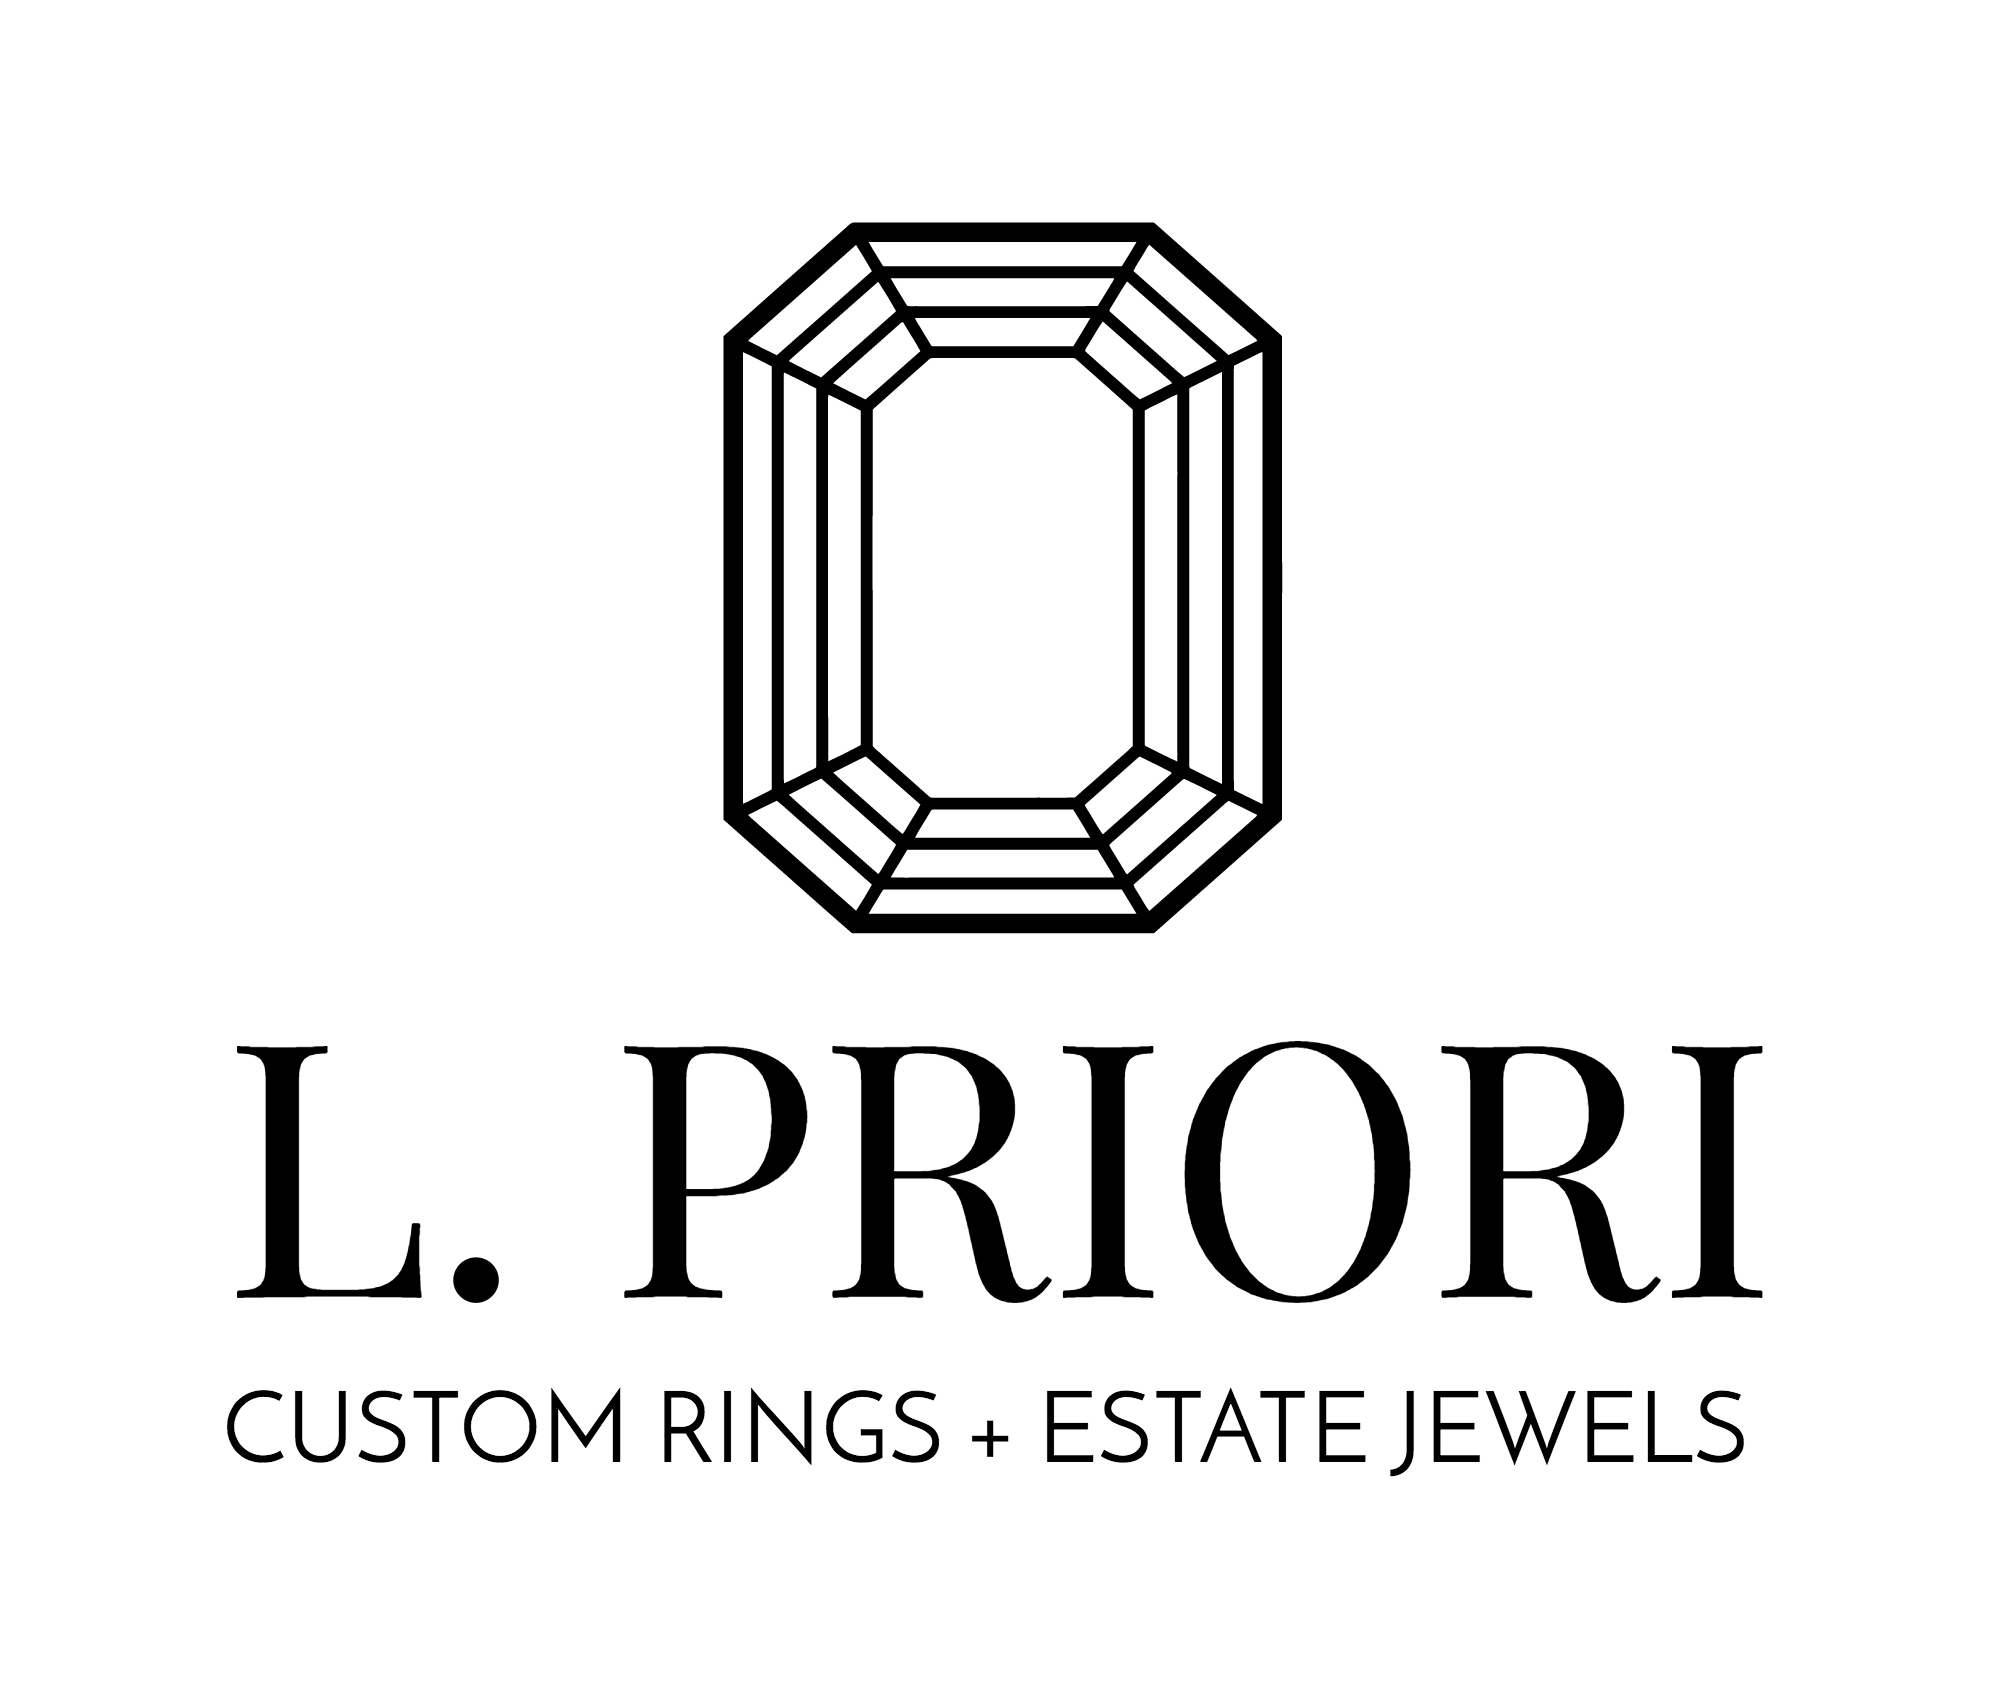 L. PRIORI-logo